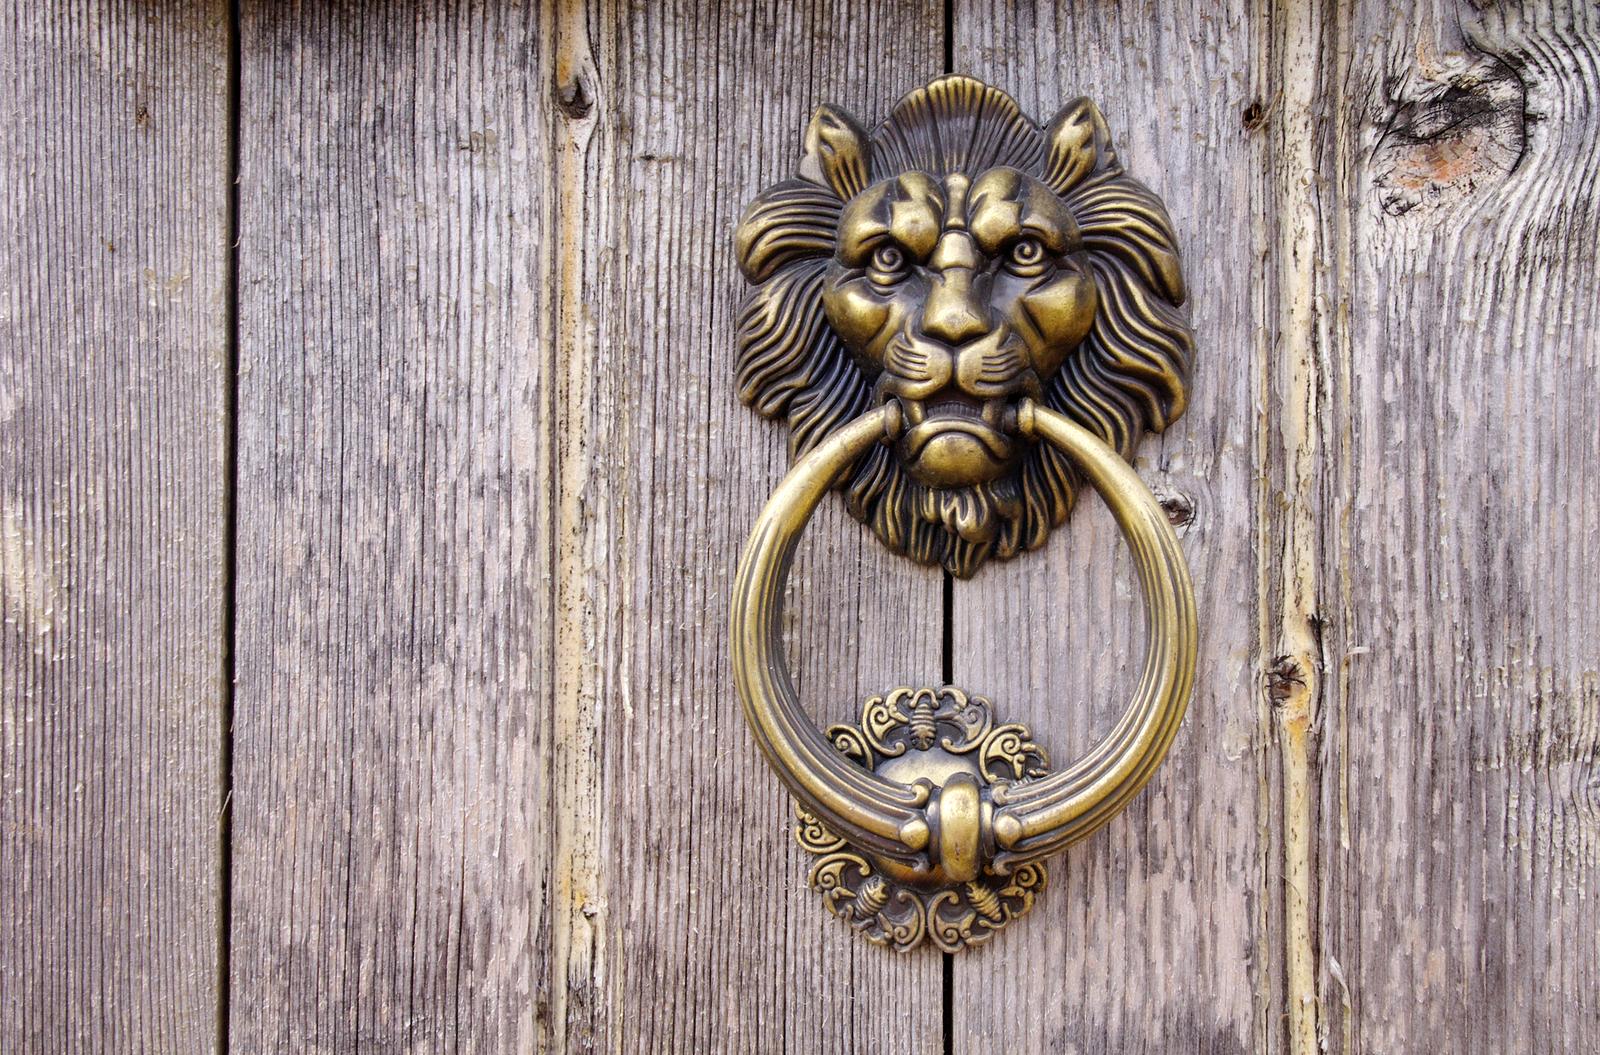 Brass makes a glamorous comeback in interior design